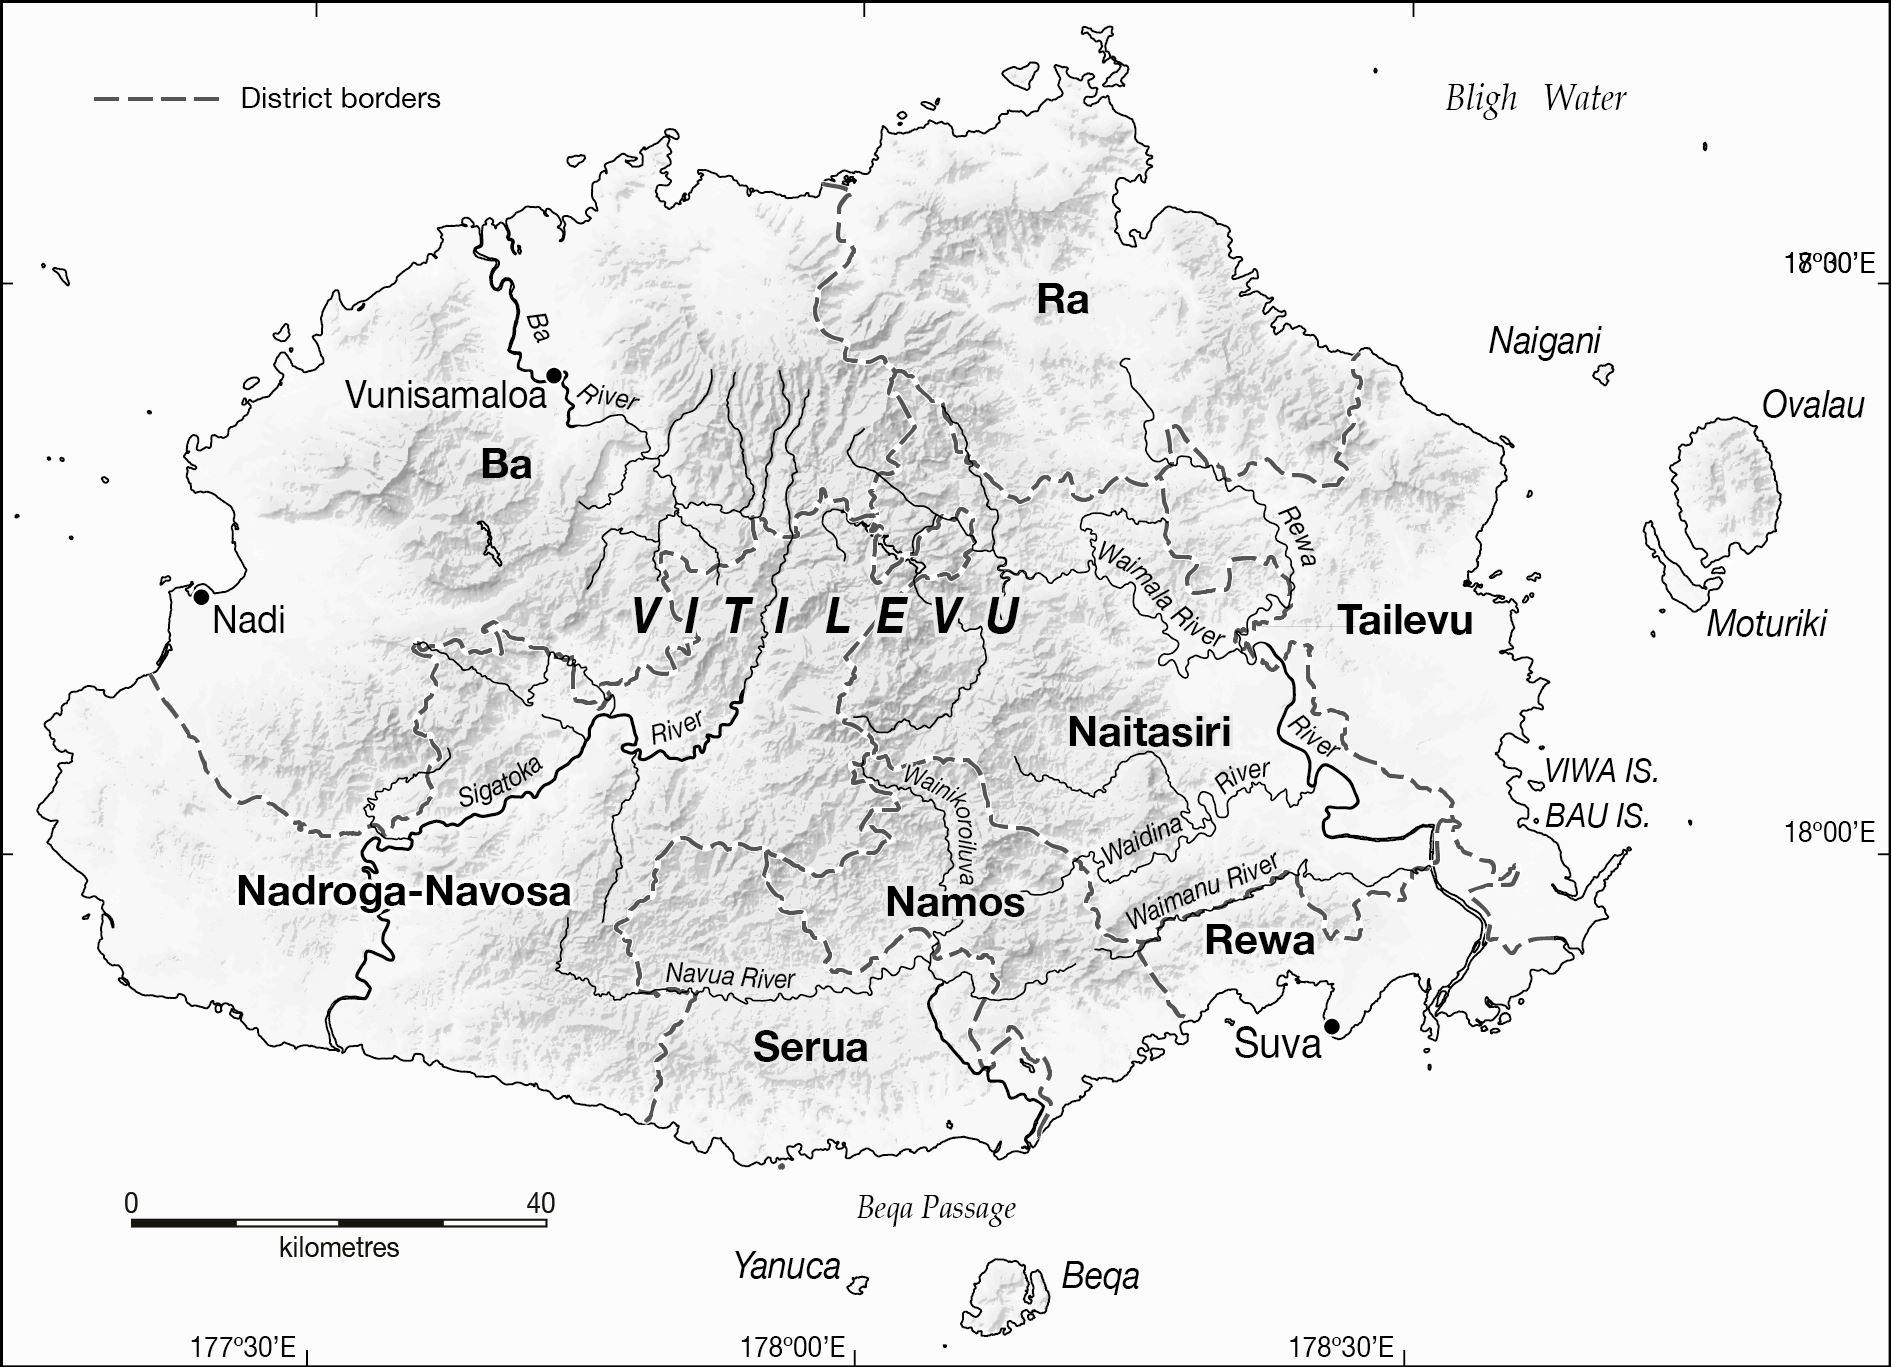 Large Viti Levu Island Maps For Free Download And Print